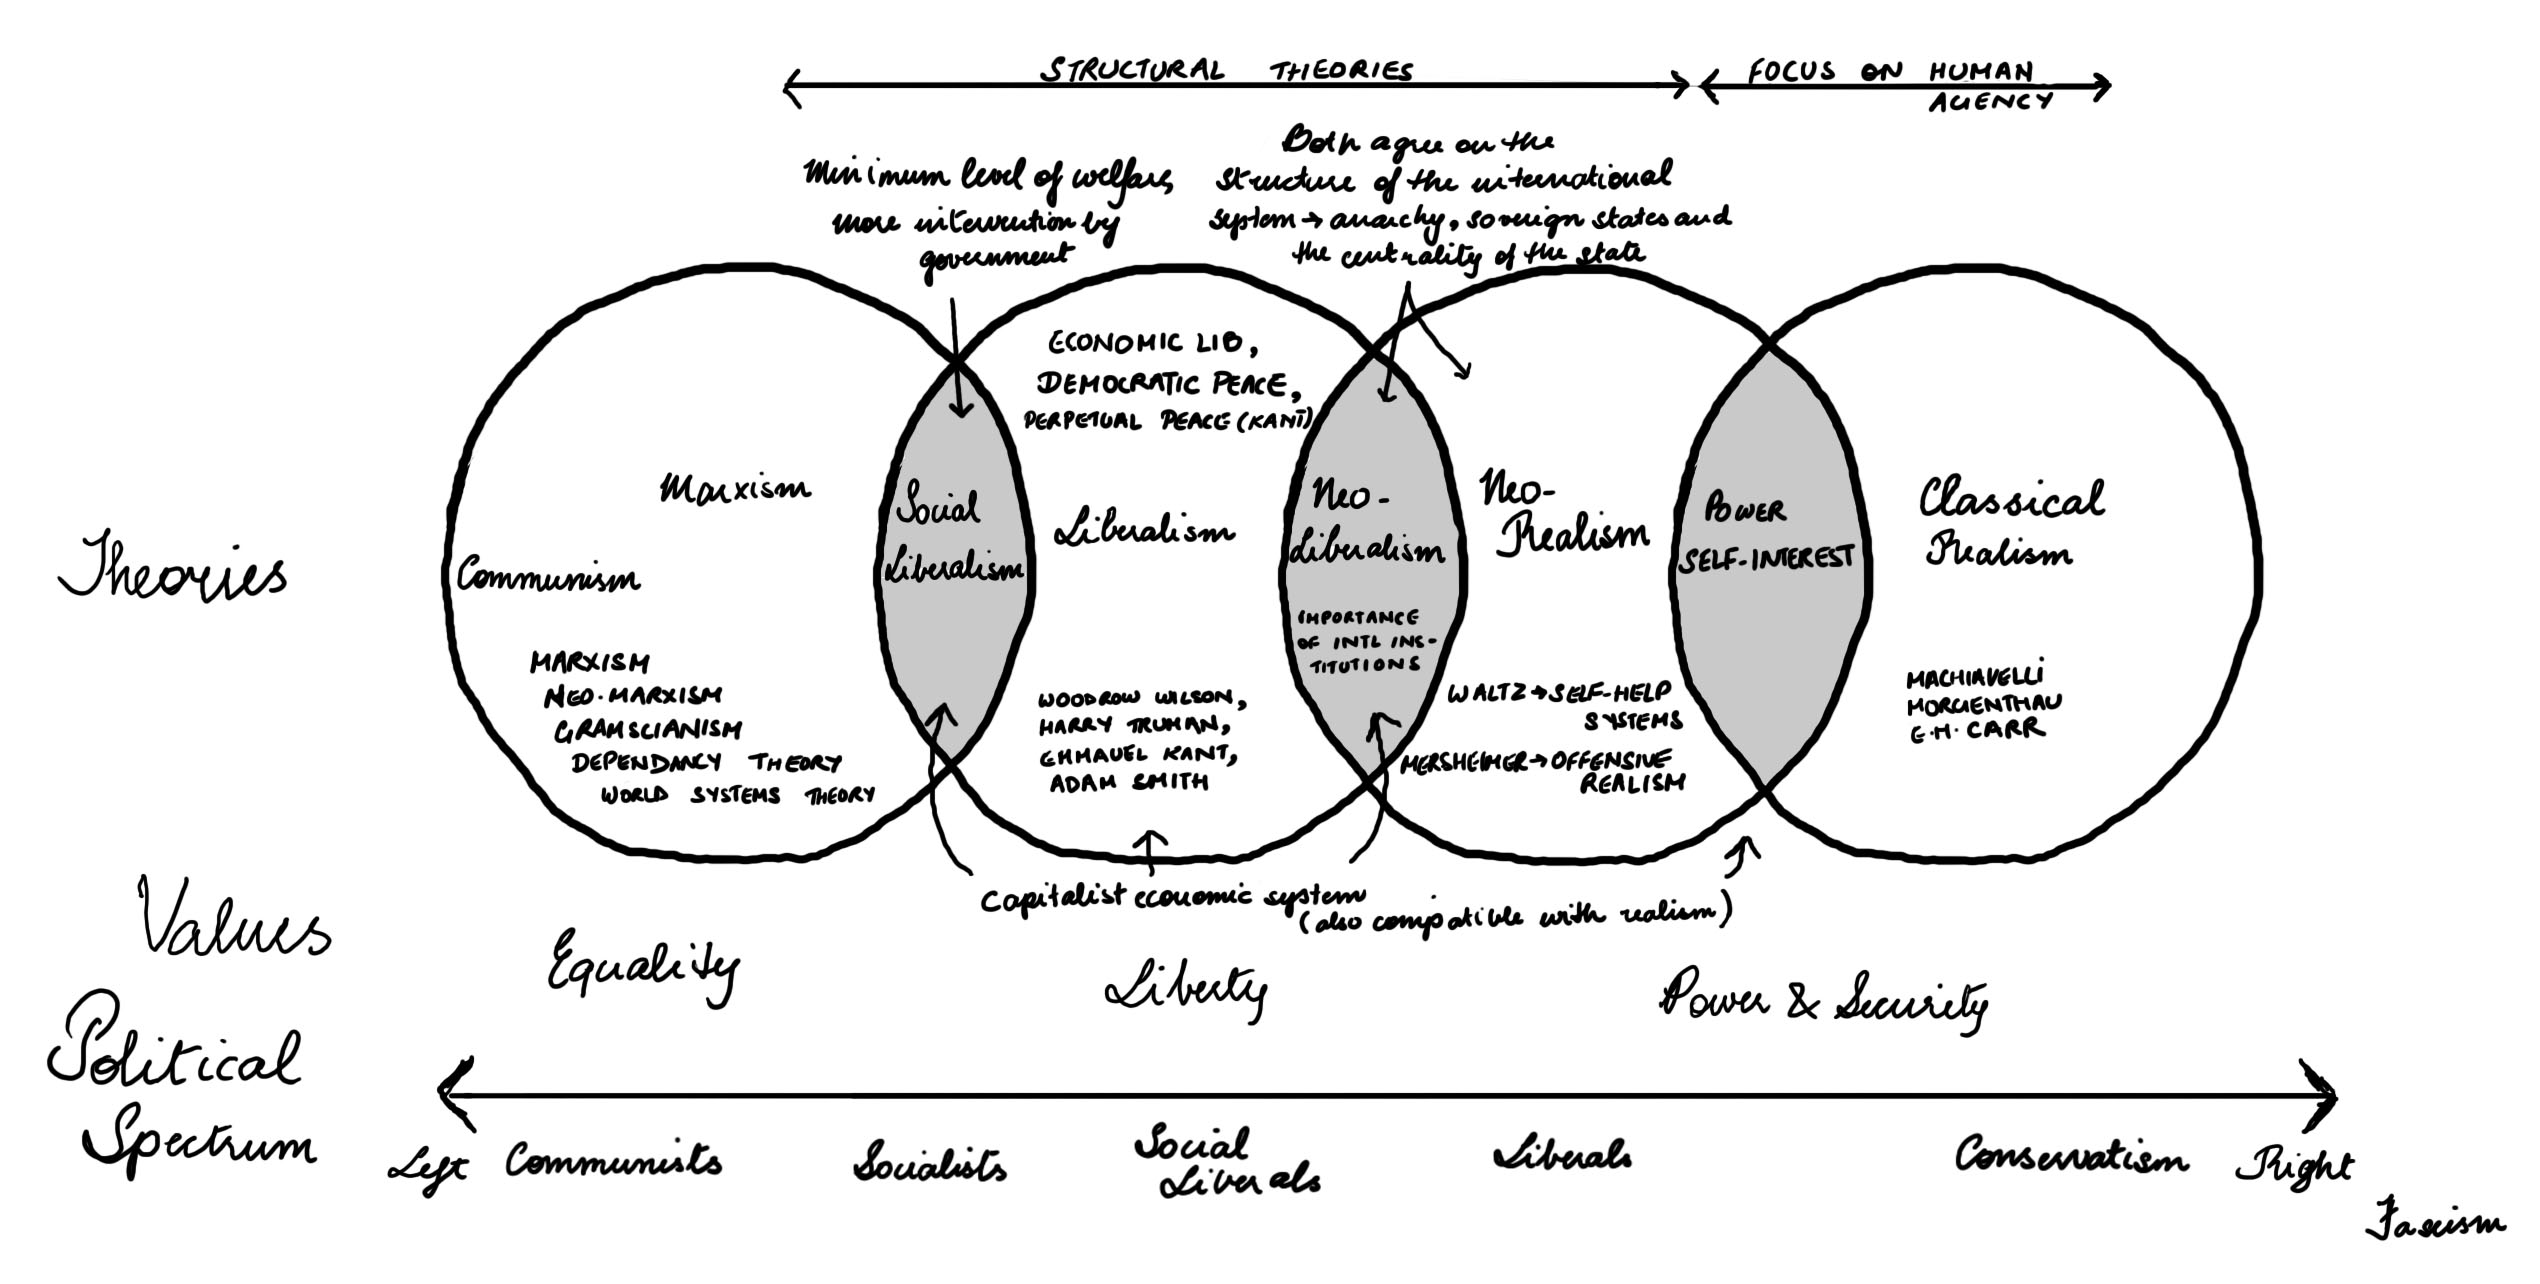 socialism and capitalism venn diagram vauxhall vectra c abs wiring the political spectrum pakistani penguintellectual